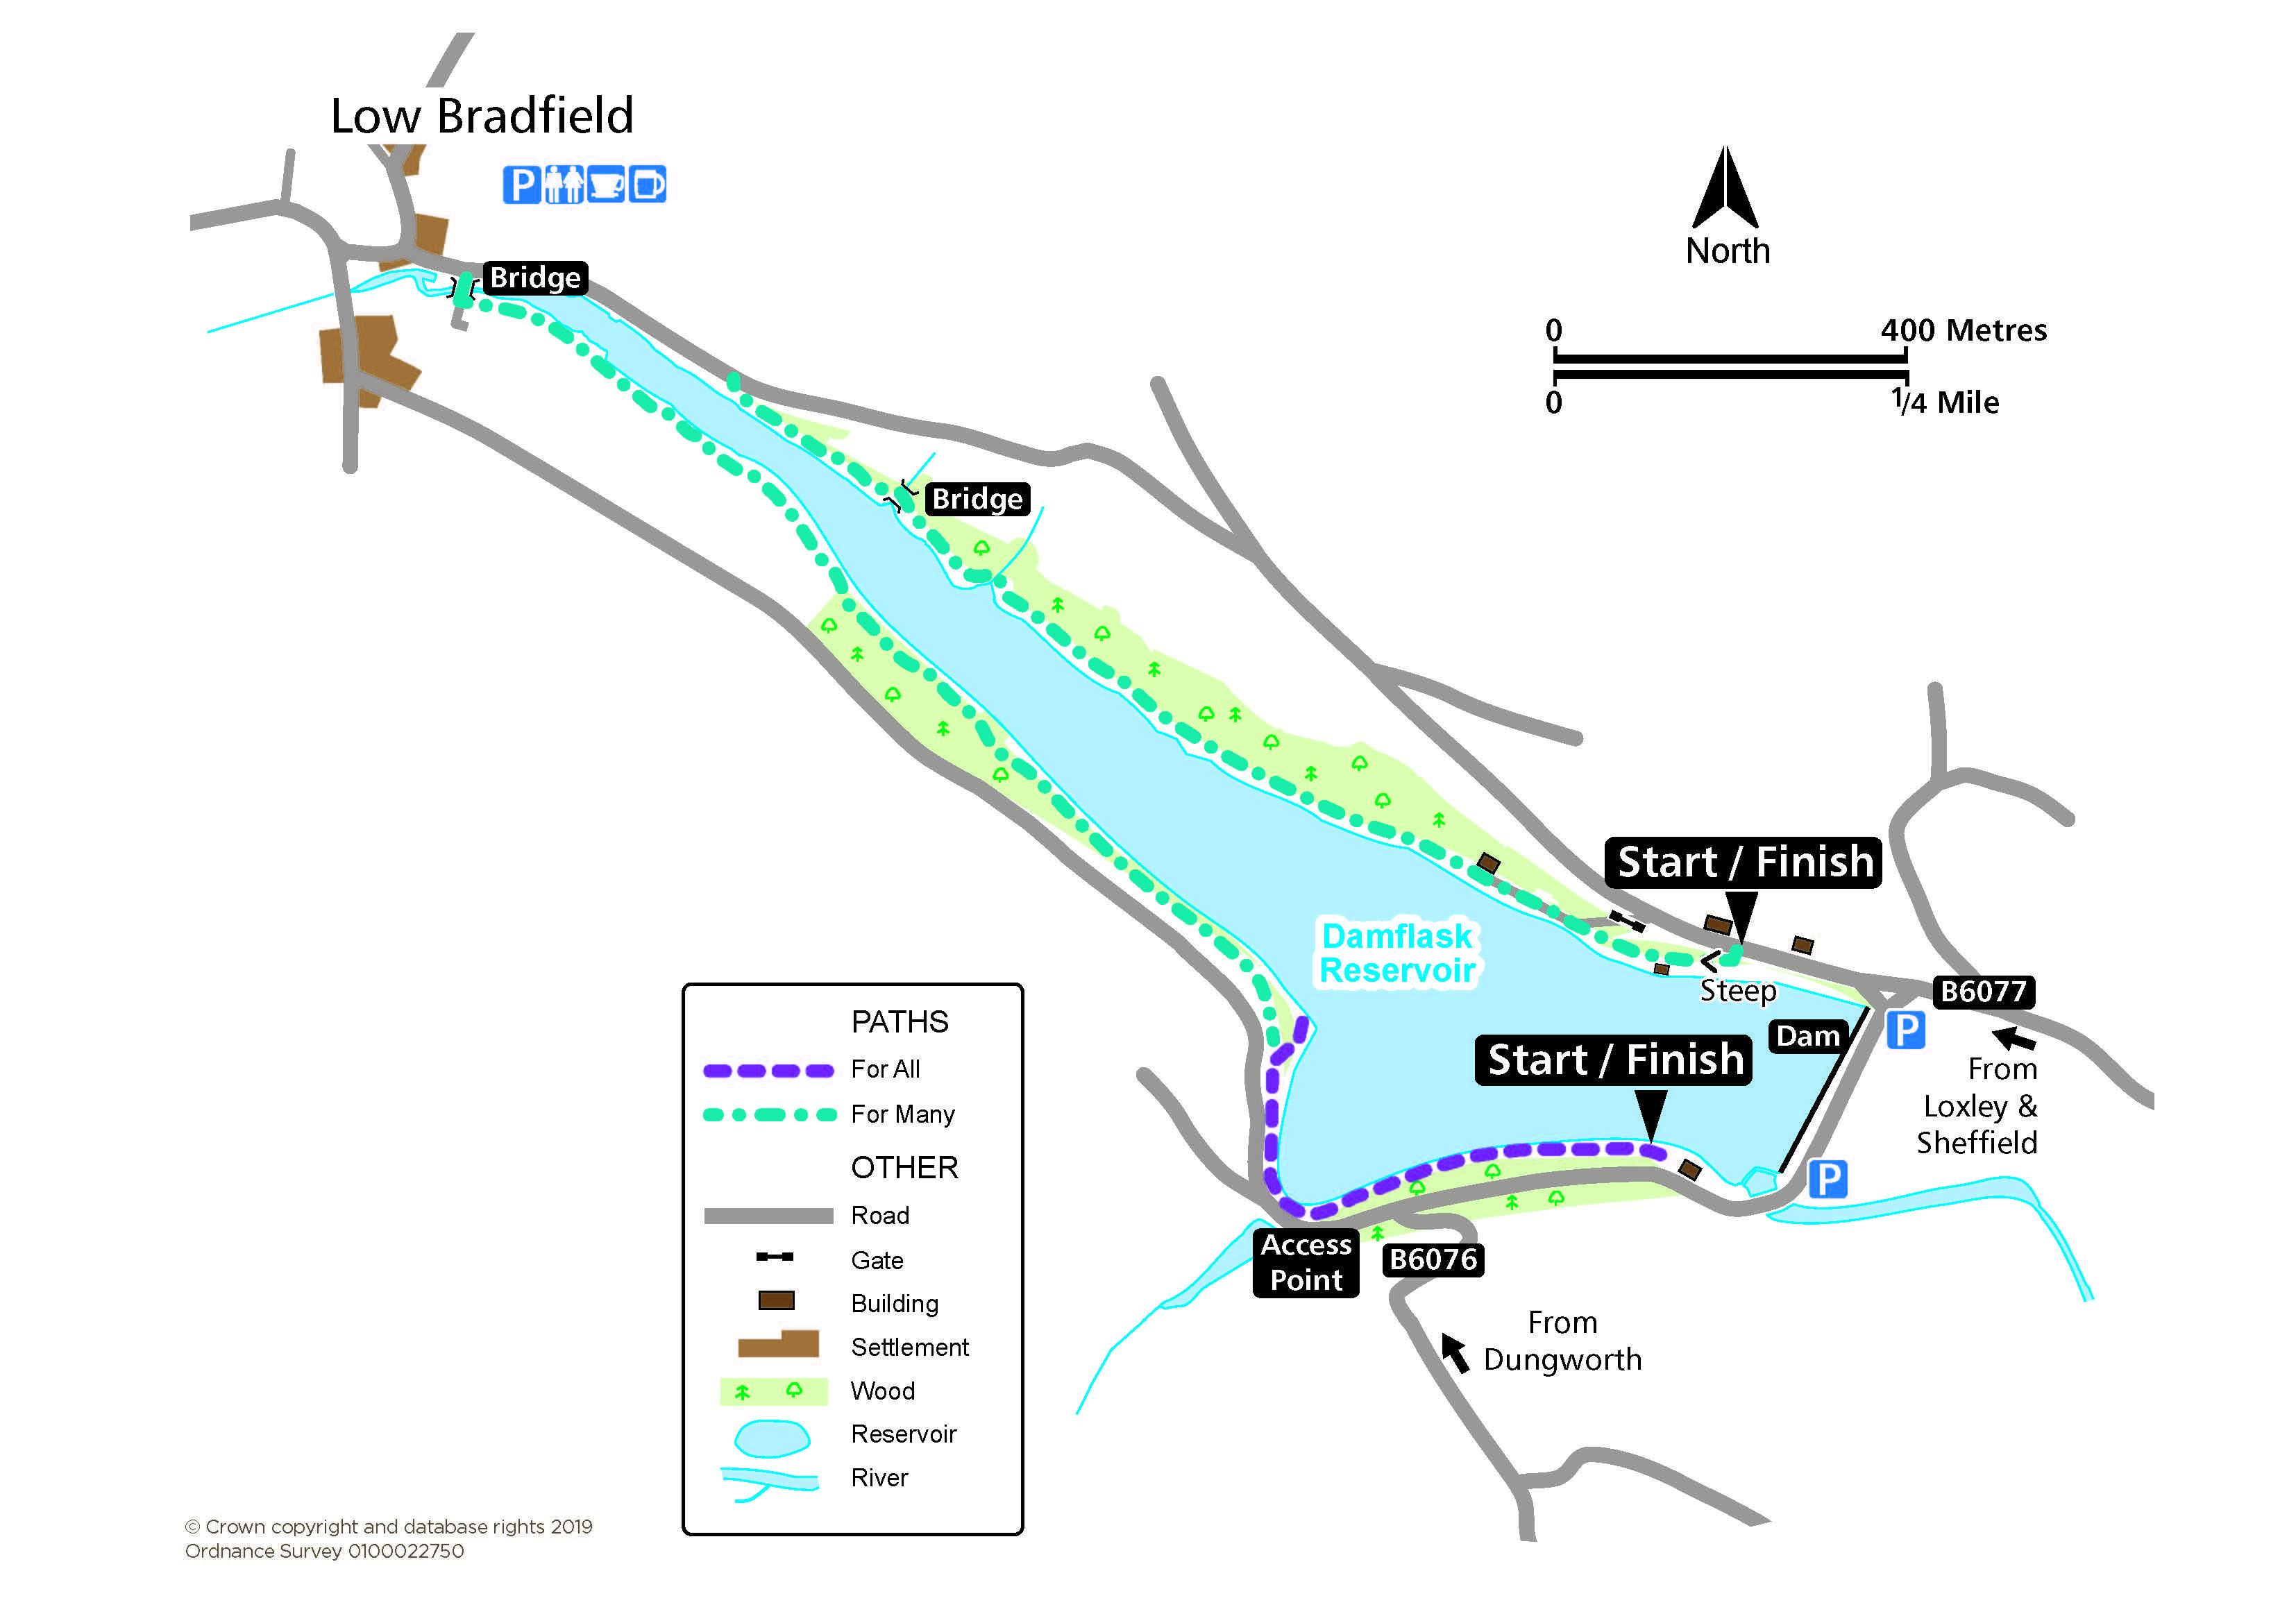 Damflask route